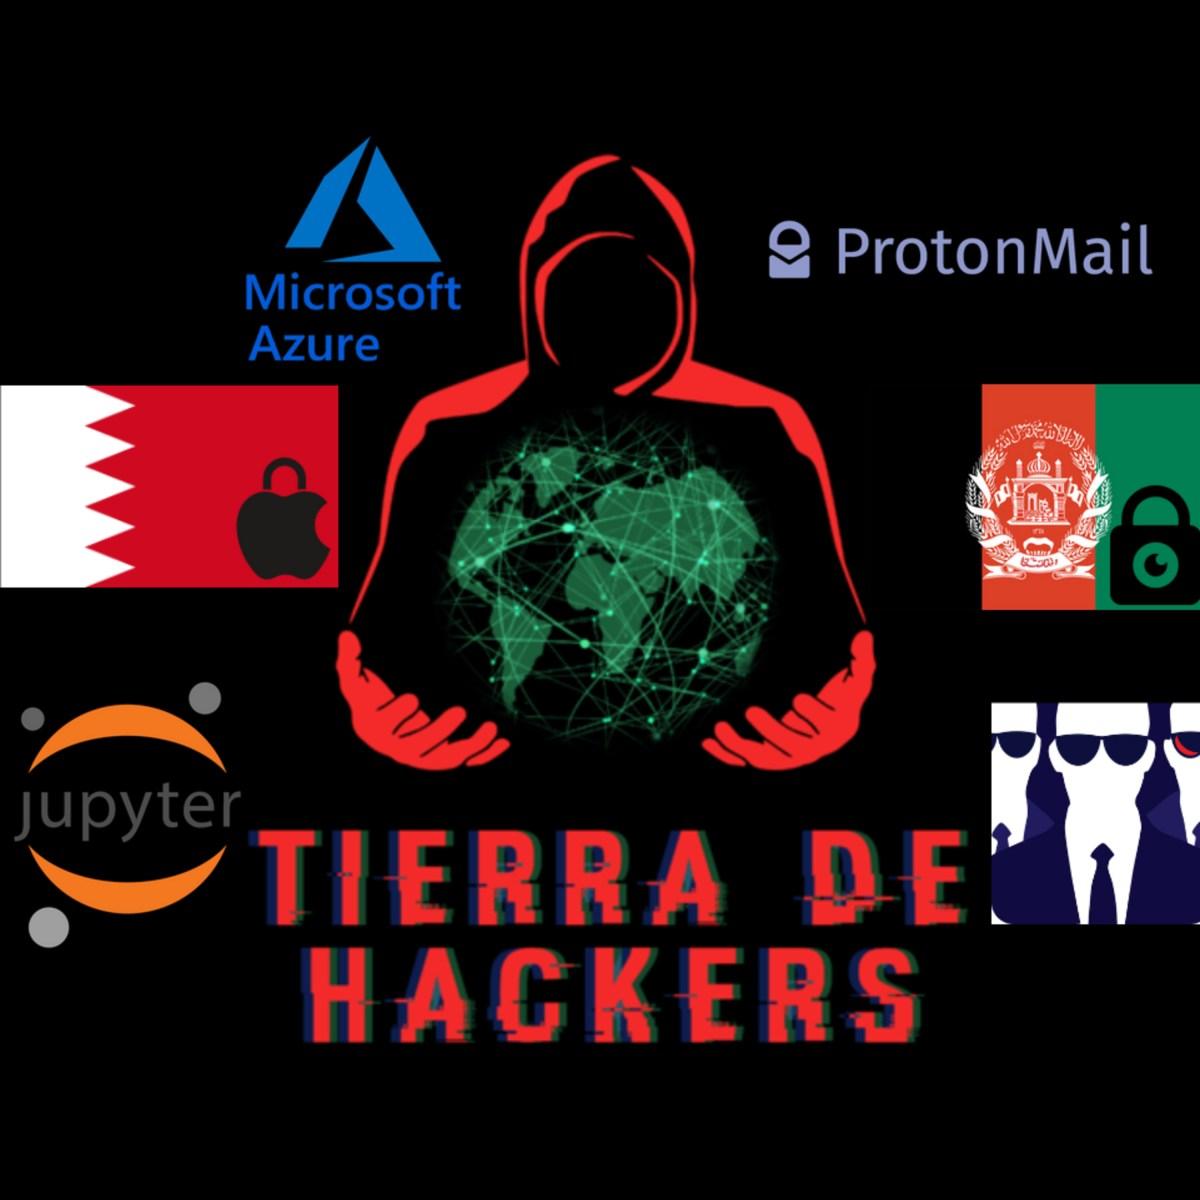 38. Afganistán agentes dobles, ProtonMail, ChaosDB, FORCEDENTRY, y Azurescape